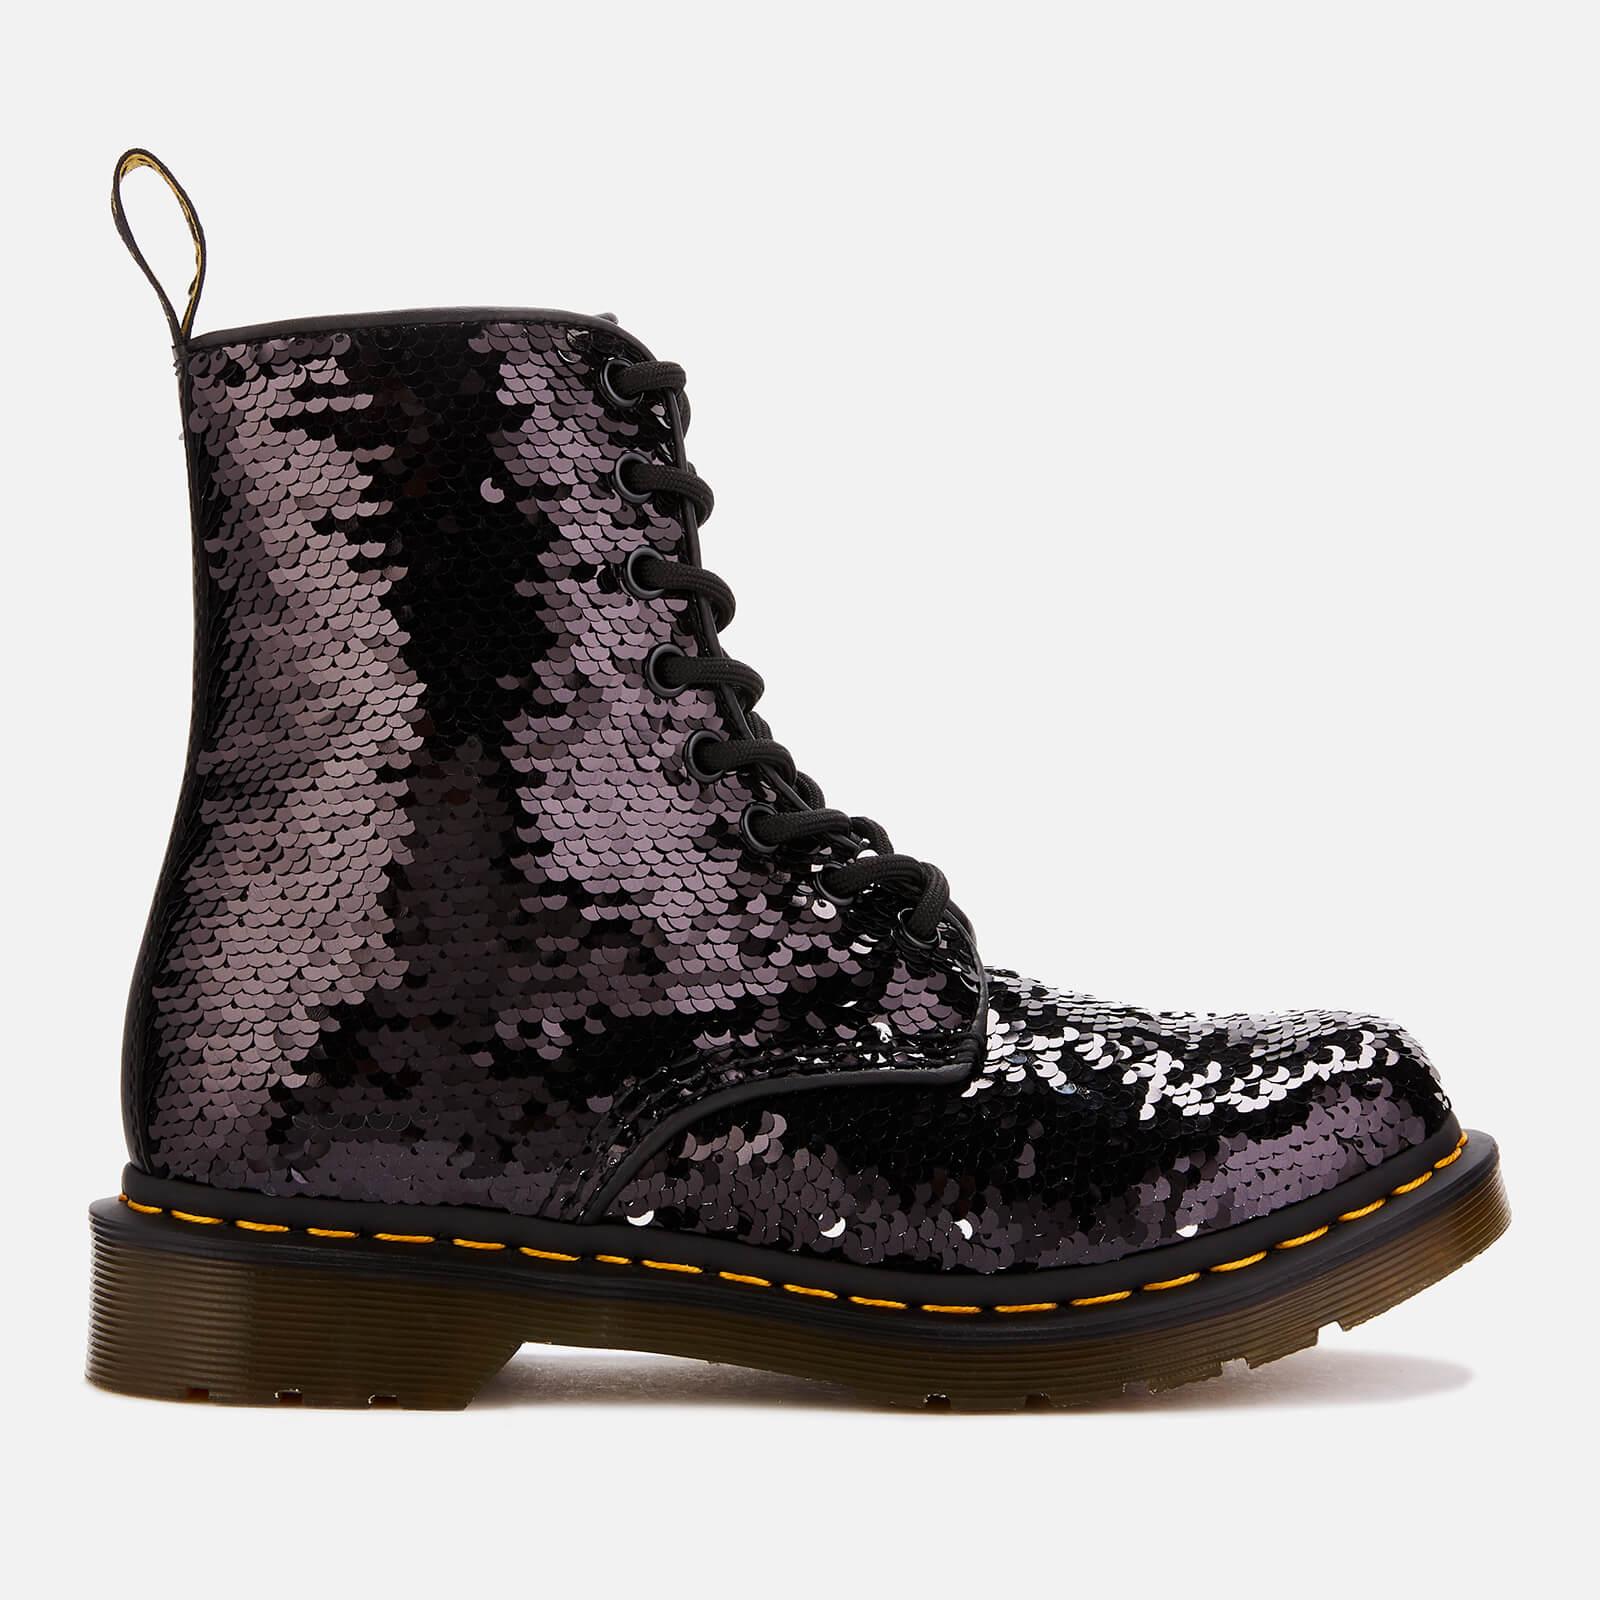 Dr. Martens Women's 1460 Sequin Pascal 8-Eye Boots - Black/Silver - UK 5 - Black